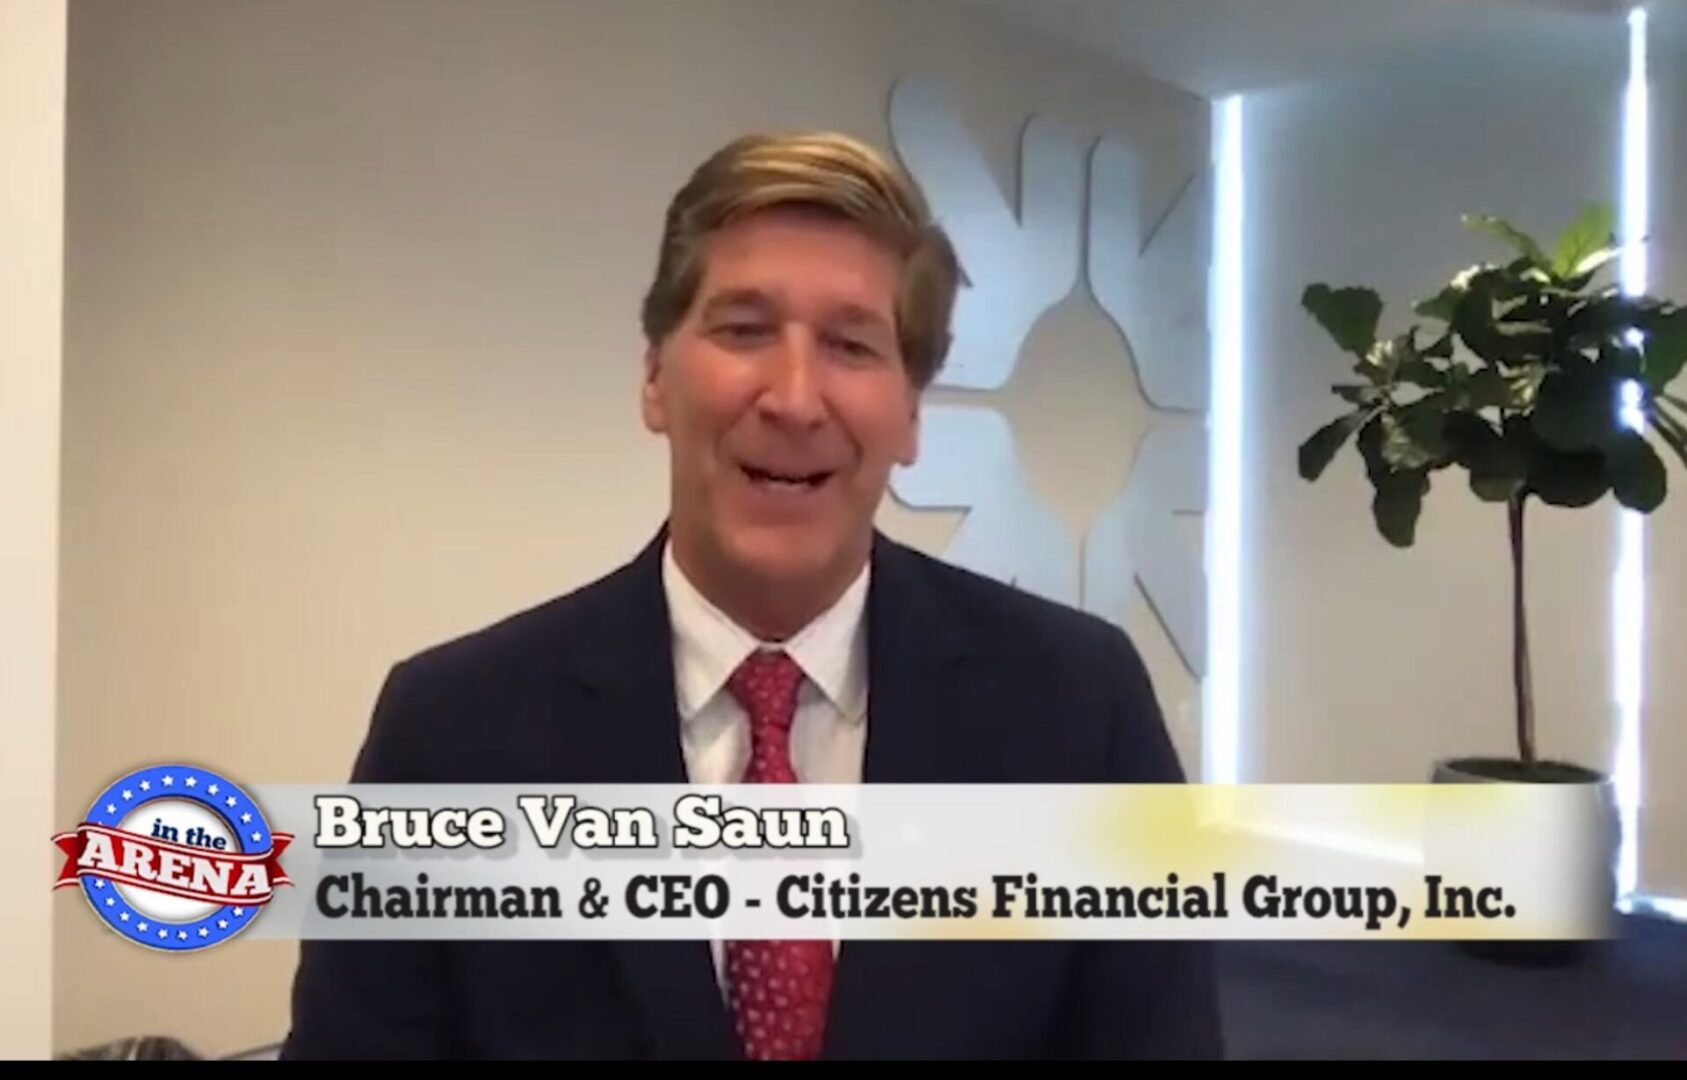 Bruce Van Saun - Ch CEO, Citizens Financial Group